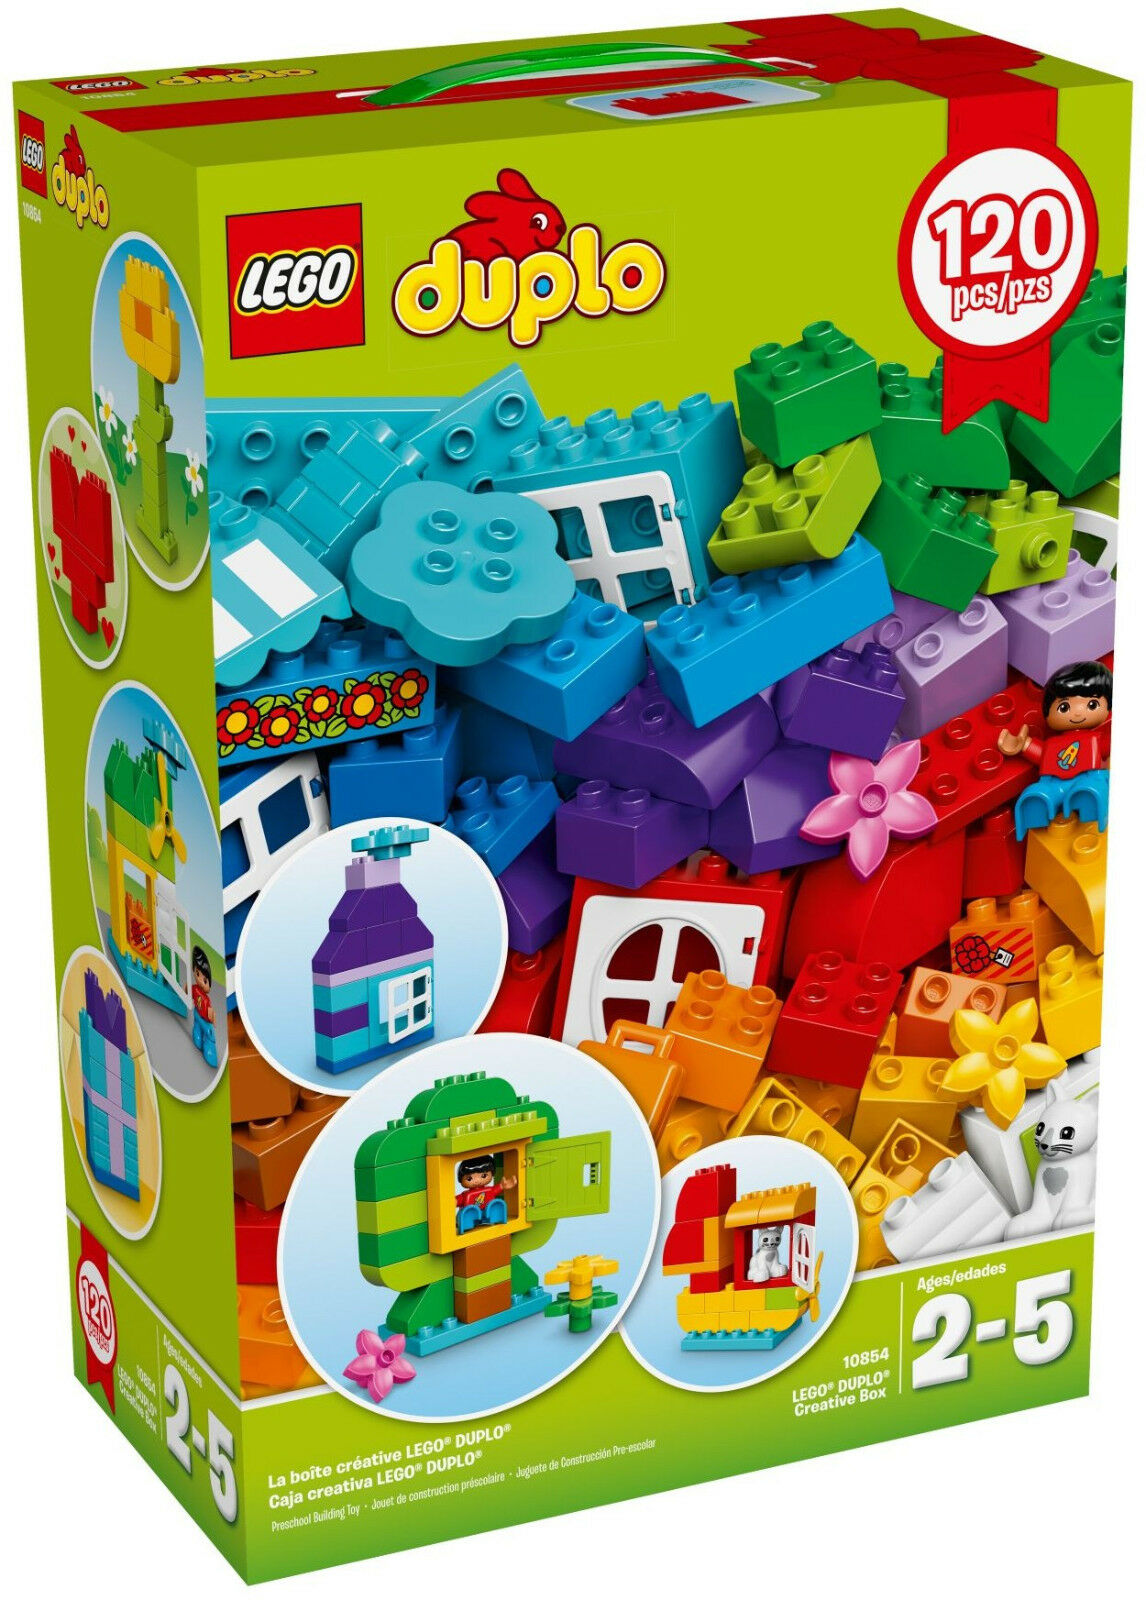 Duplo - Creative Box 120 Piece Set  10854 NEW FREE SHIP Lego Preschool NIB